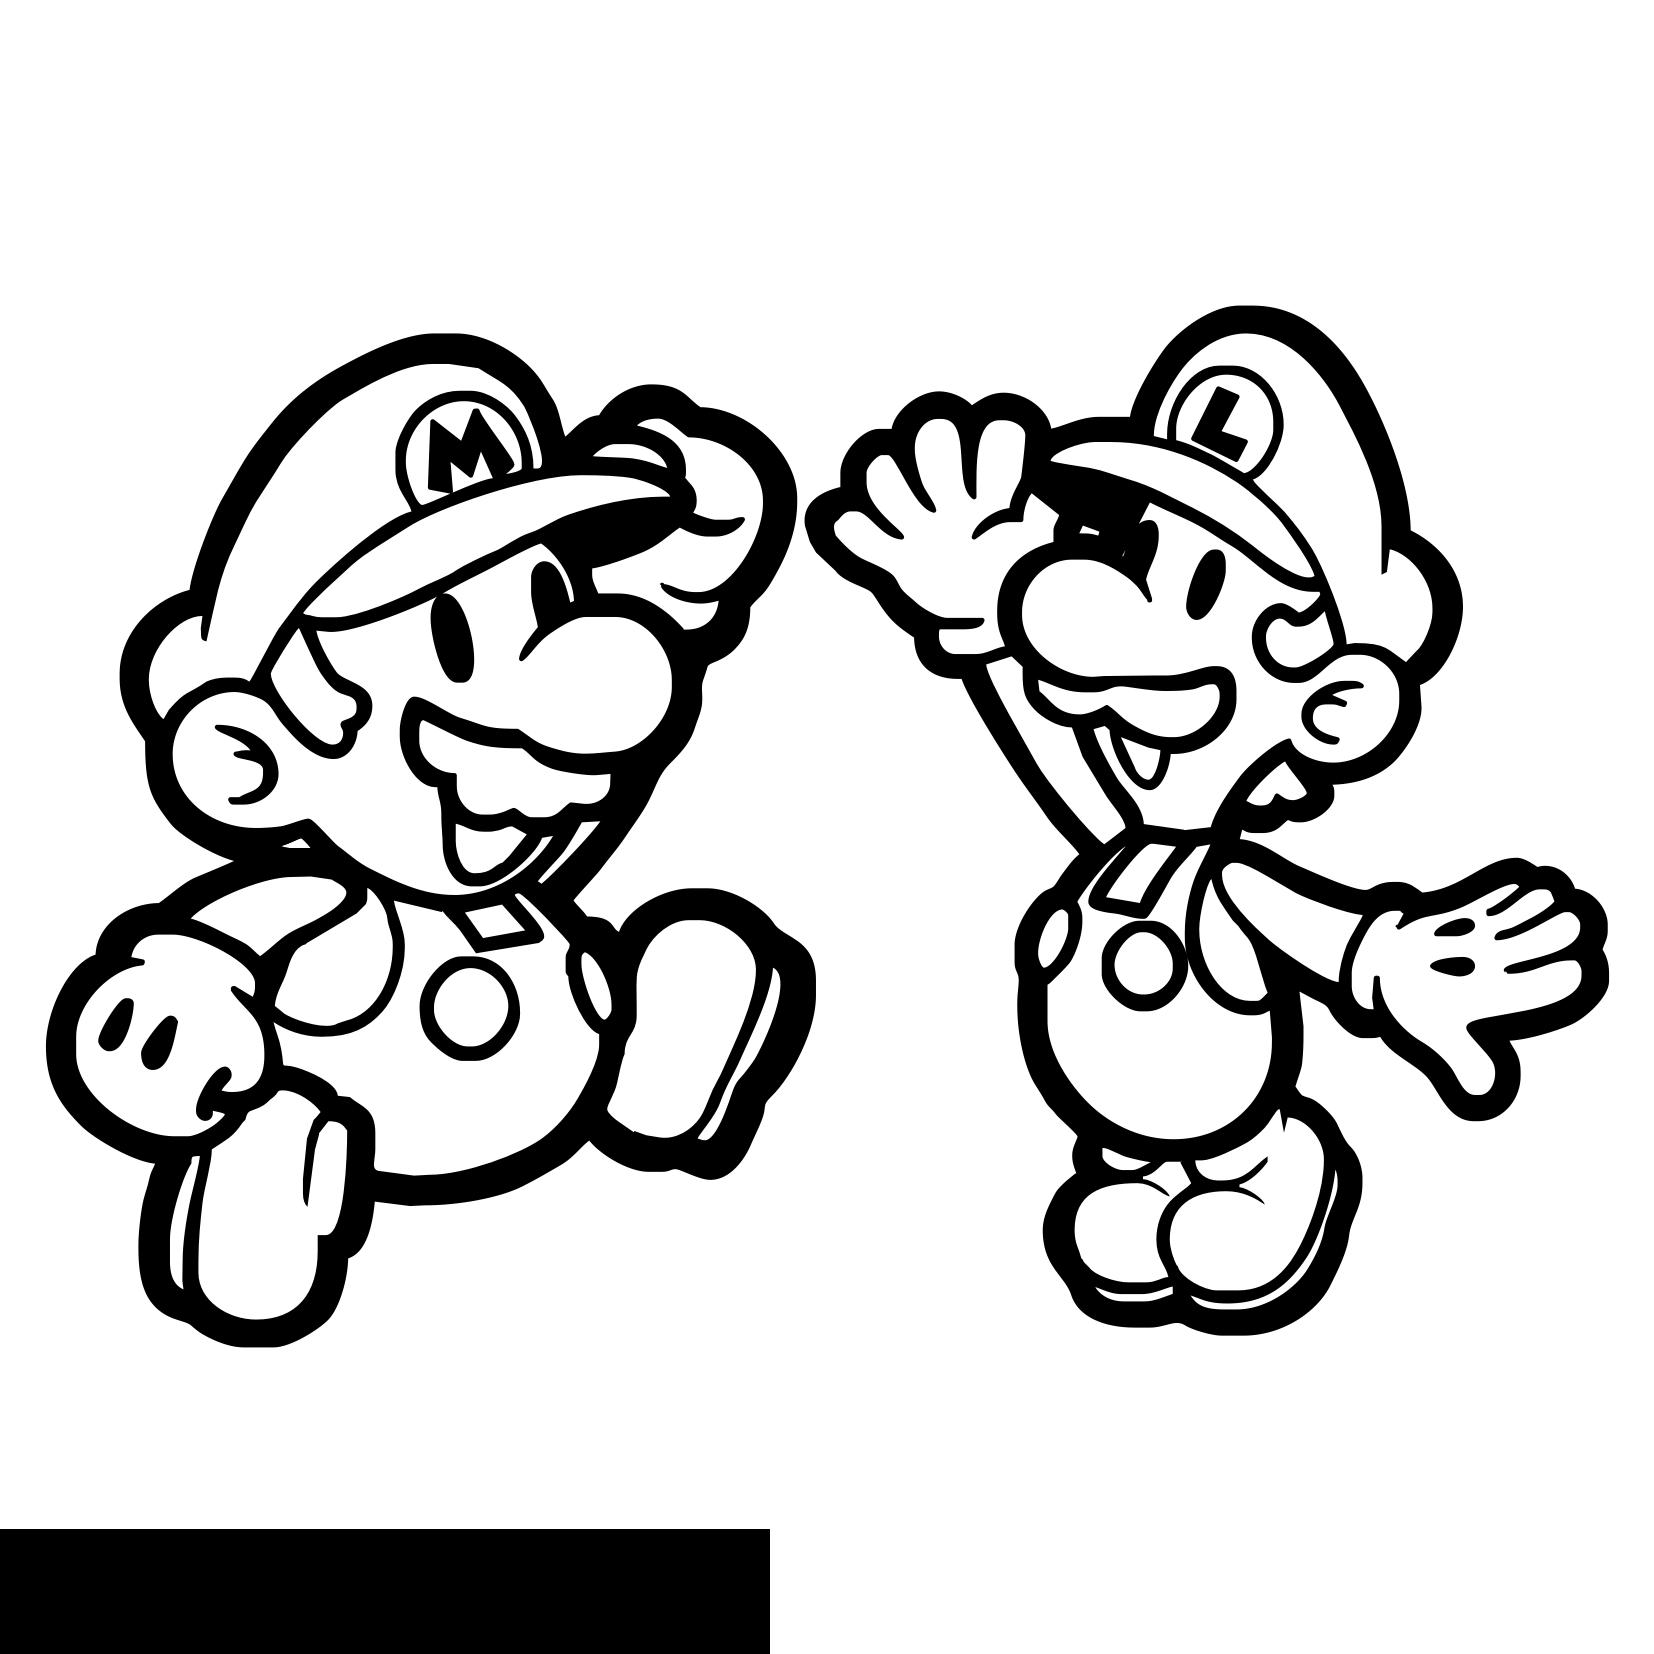 Mario Drawing at GetDrawings.com | Free for personal use Mario ...